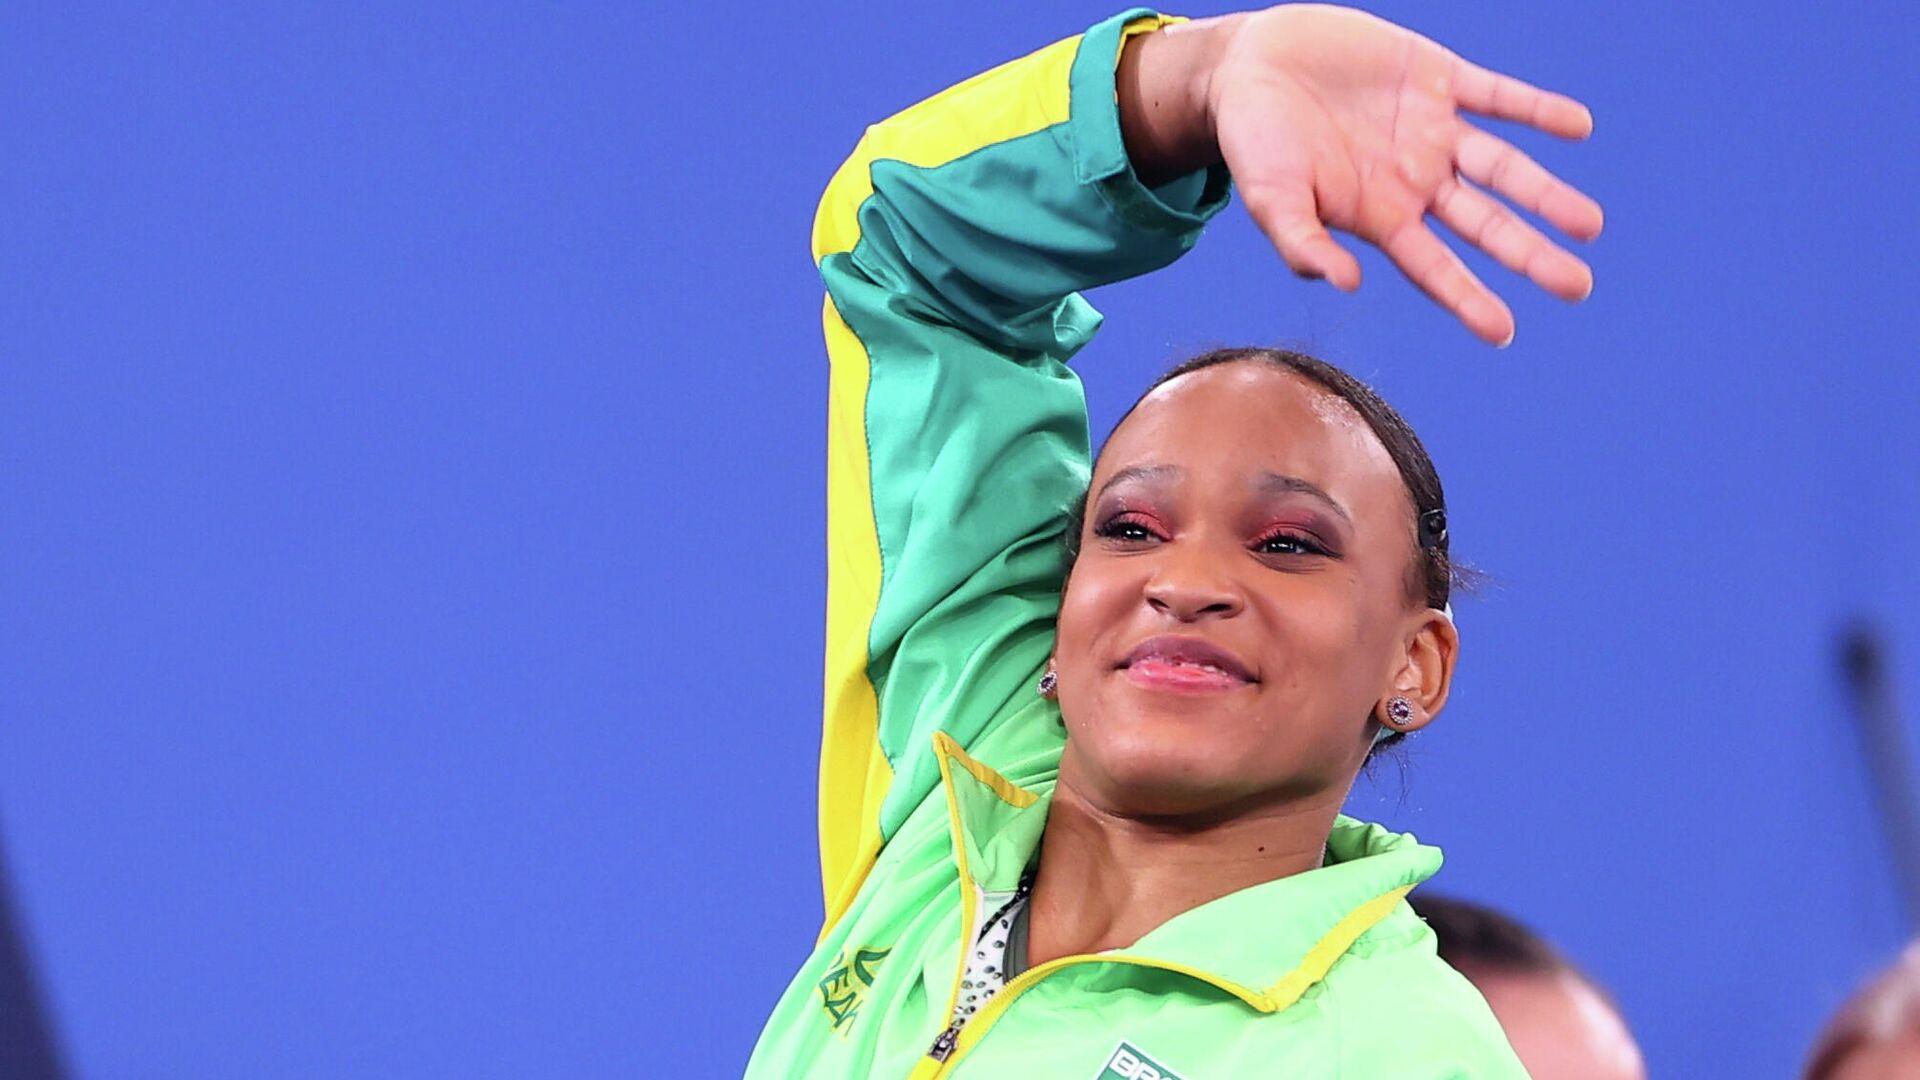 La gimnasta brasileña Rebeca Andrade celebra su victoria en los JJOO Tokio 2020, el 1 de agosto - Sputnik Mundo, 1920, 01.08.2021